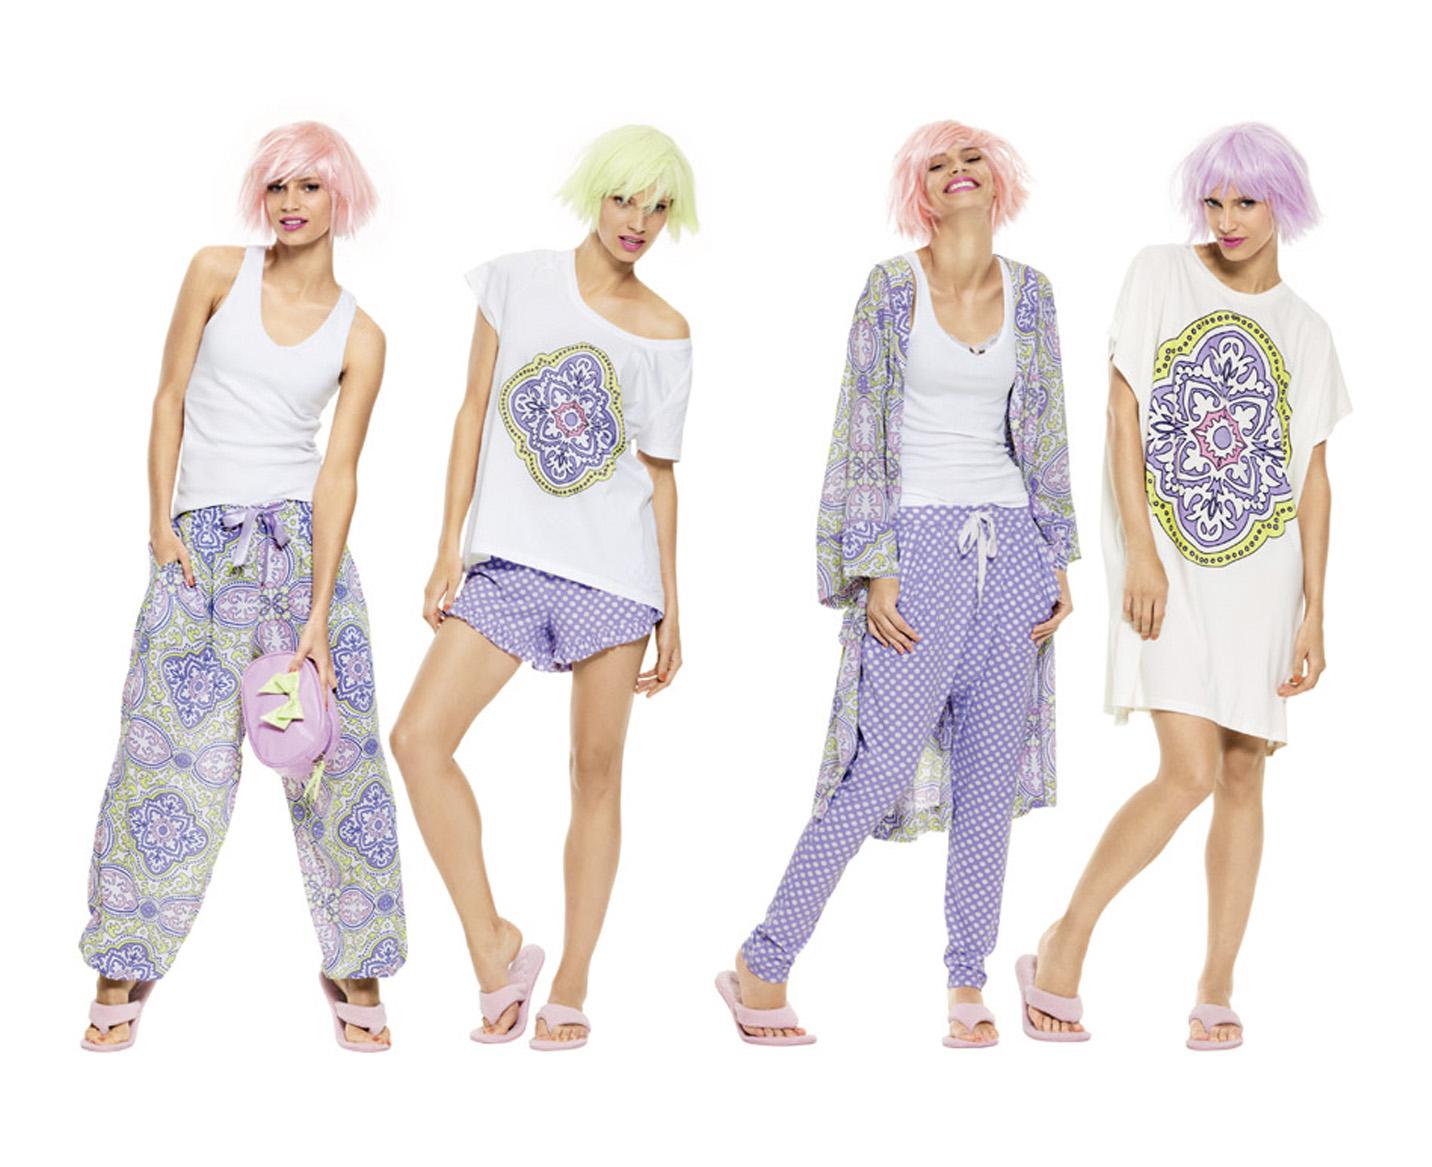 a50fe7eff4e4 Designer Sleepwear – Peter Alexander – littlemisseboni